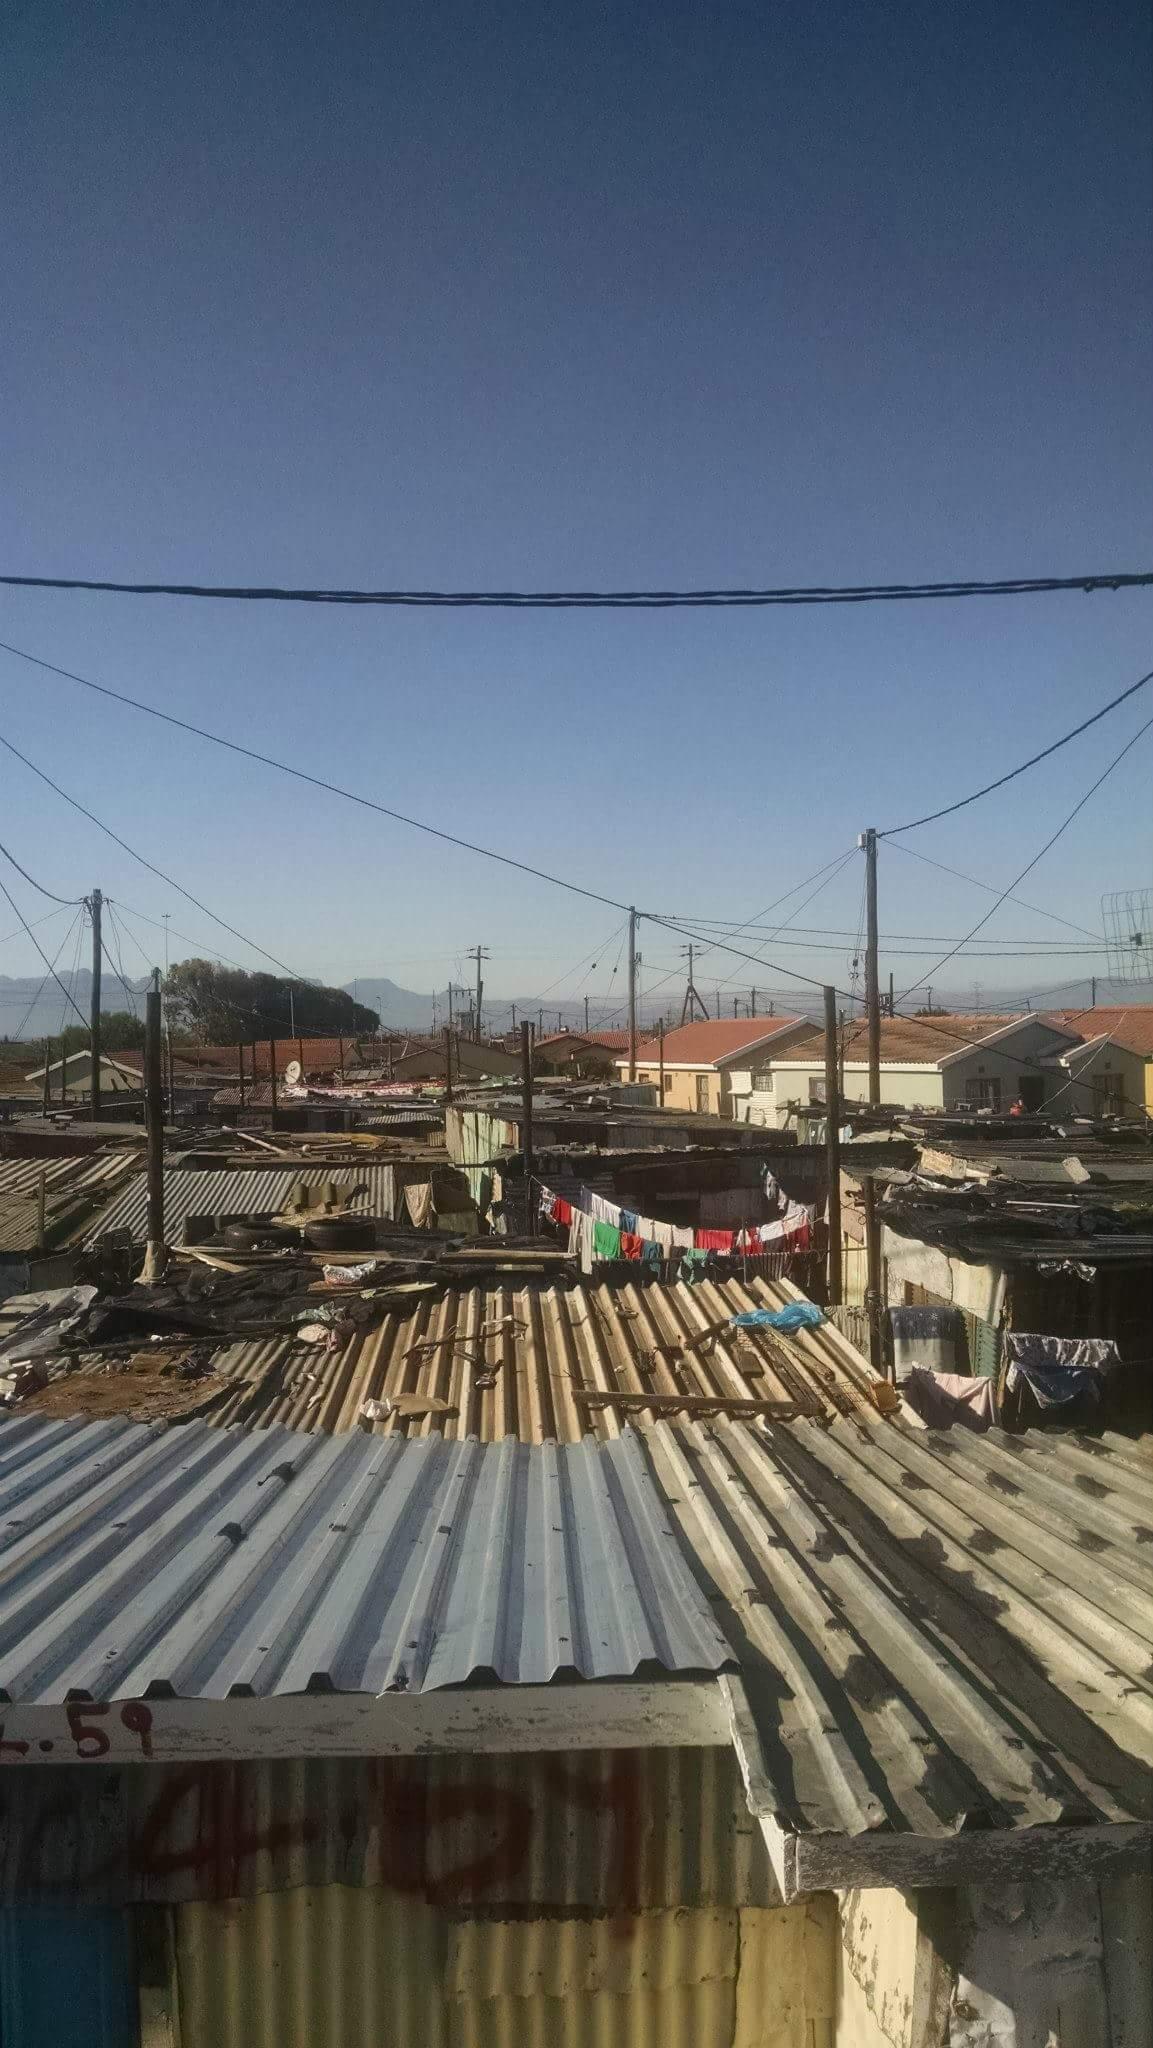 Langa, South Africa